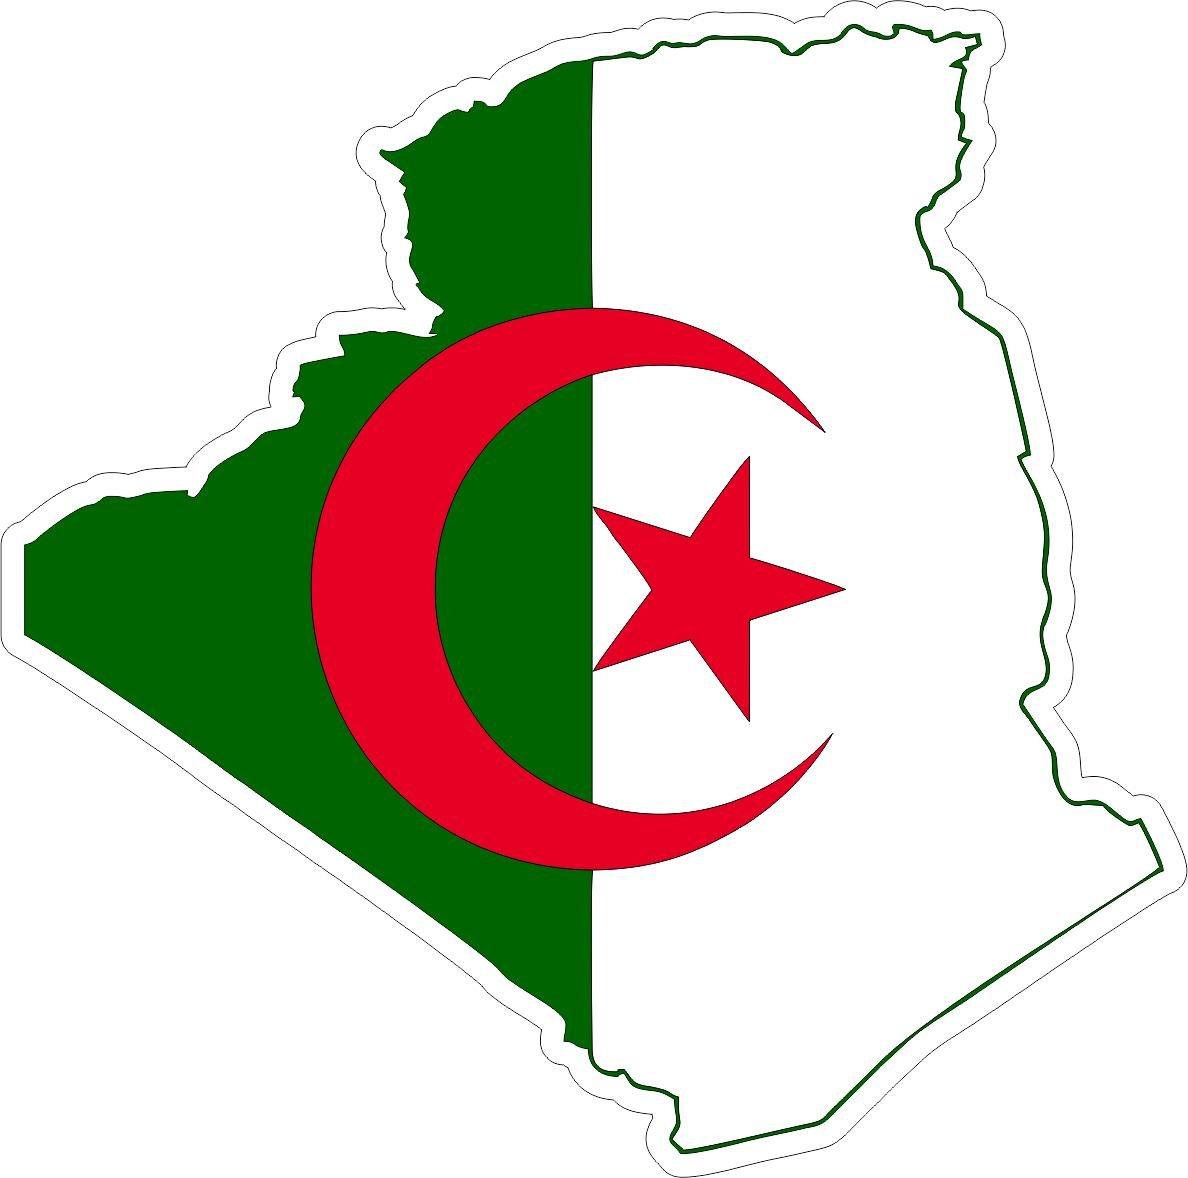 Autocollant sticker adhesif voiture vinyle drapeau carte algerie